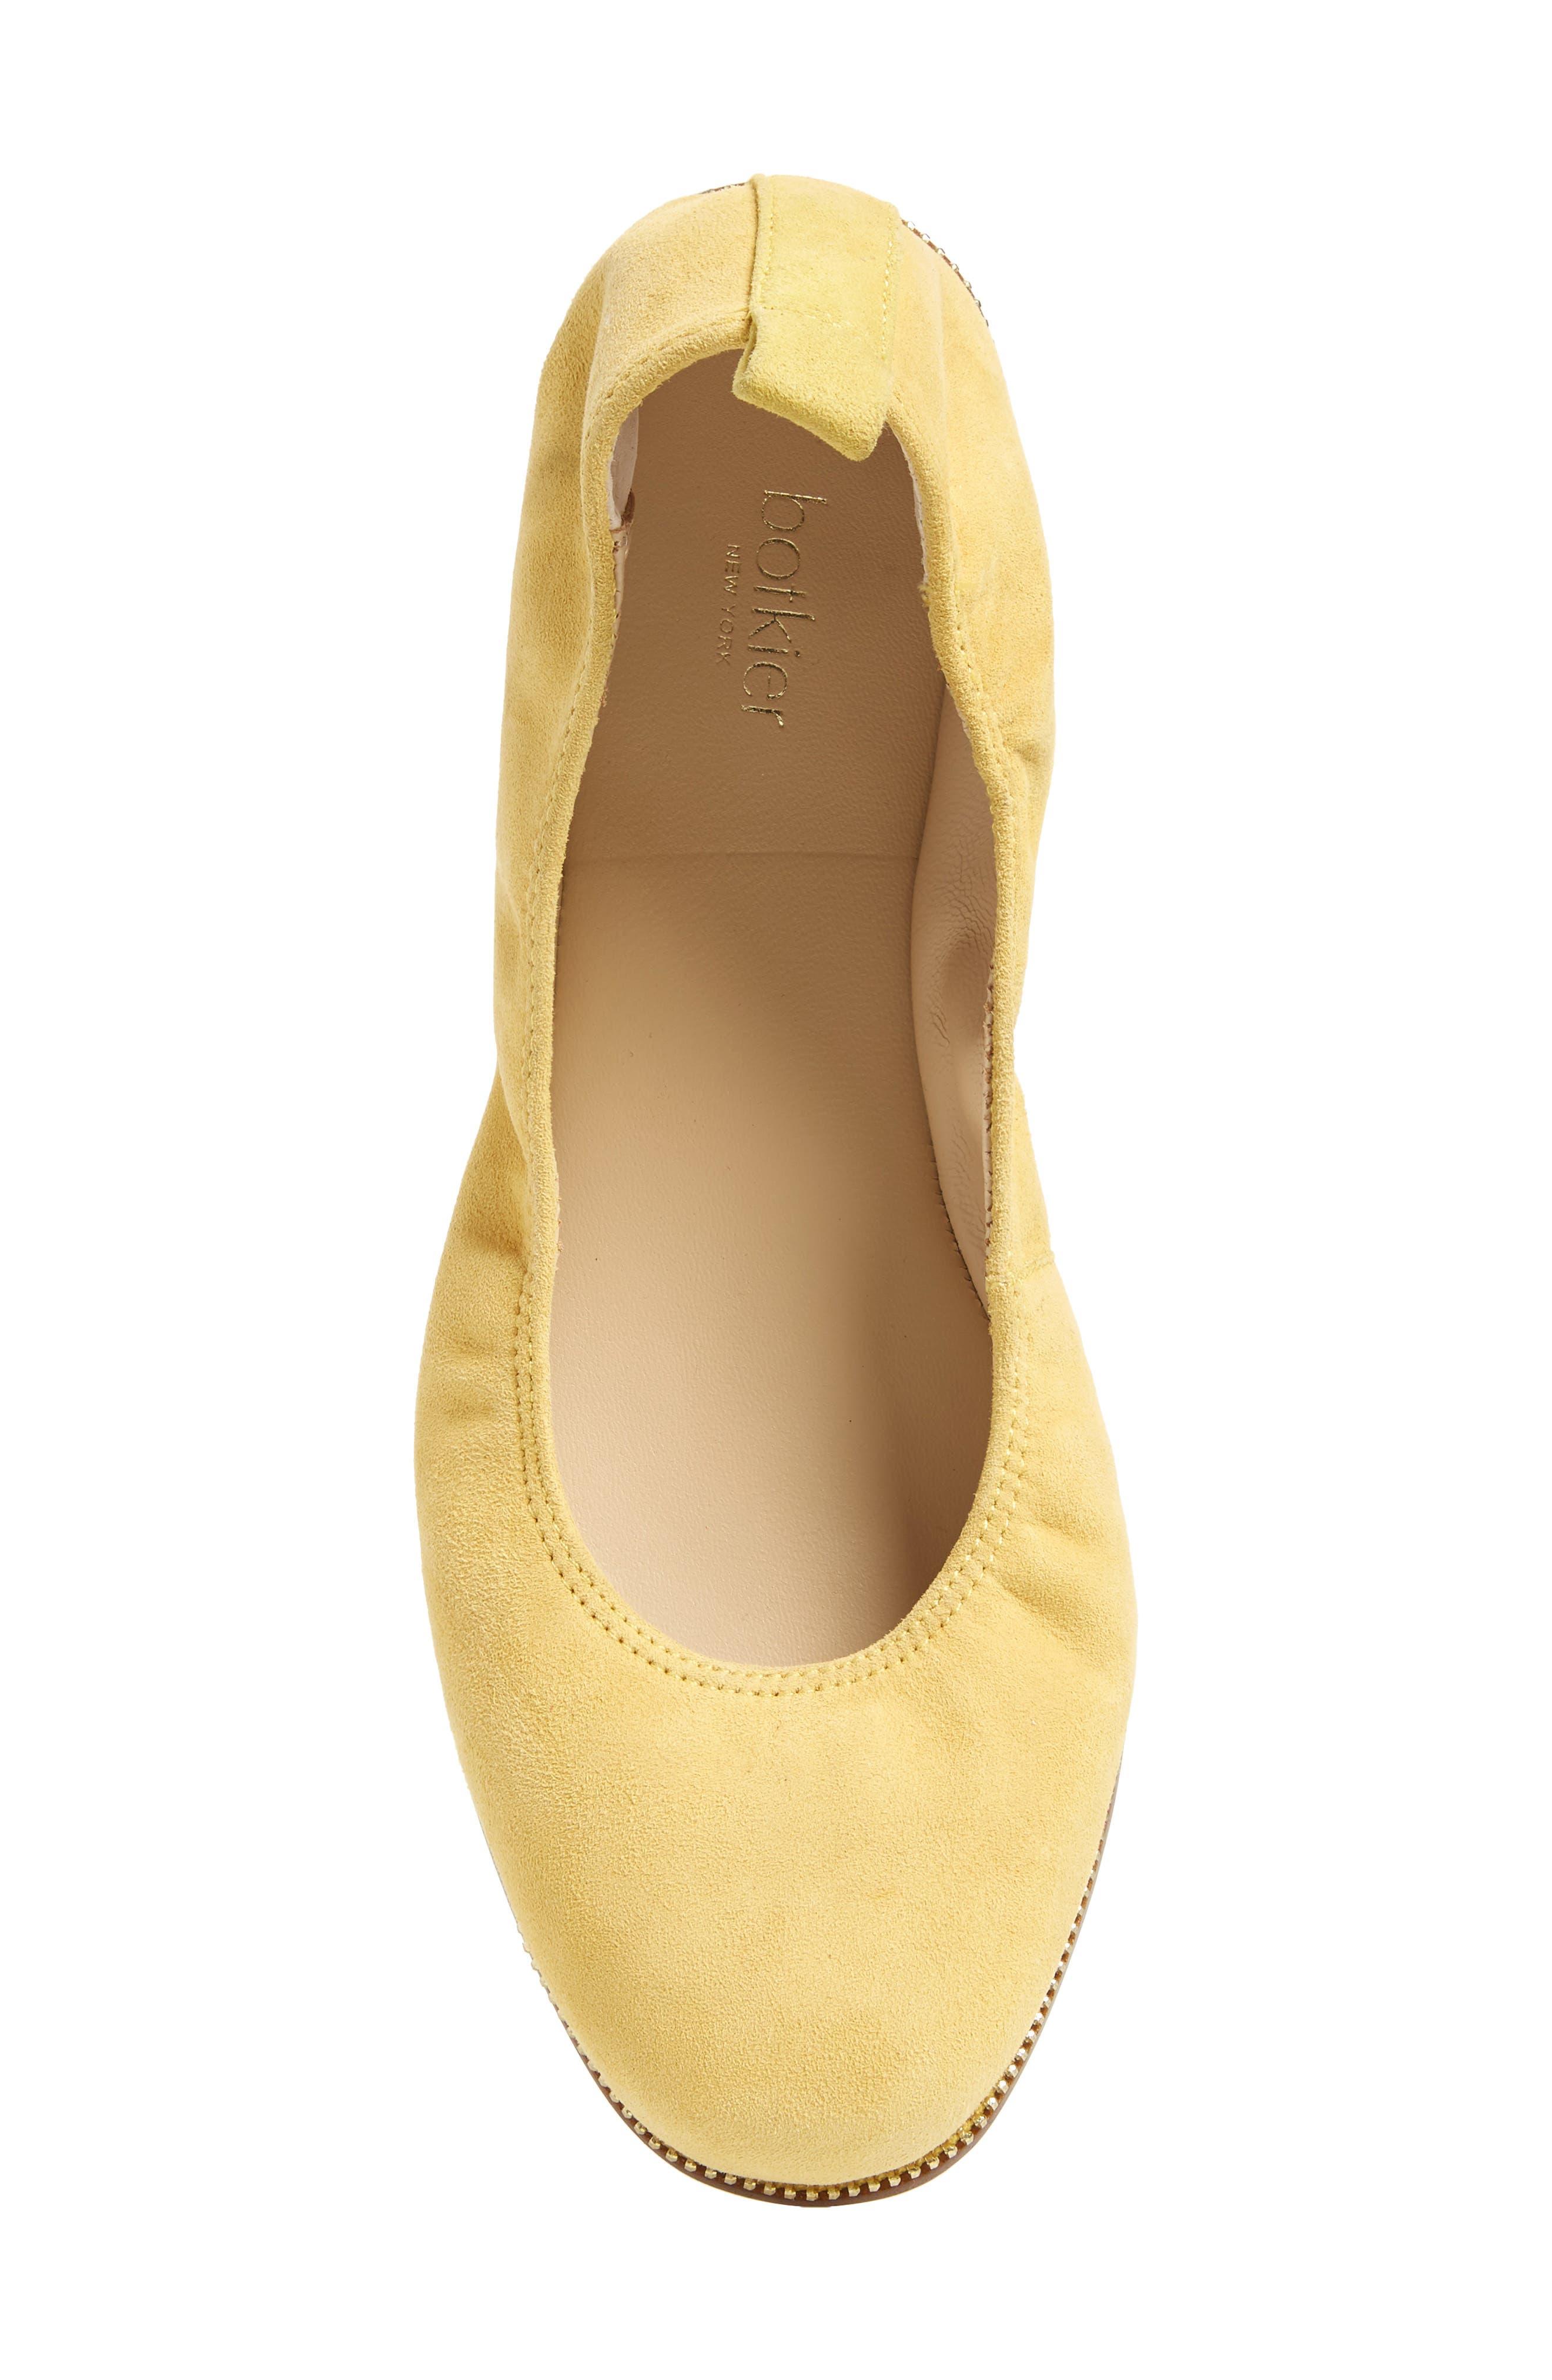 Mason Ballet Flat,                             Alternate thumbnail 4, color,                             Pineapple Suede